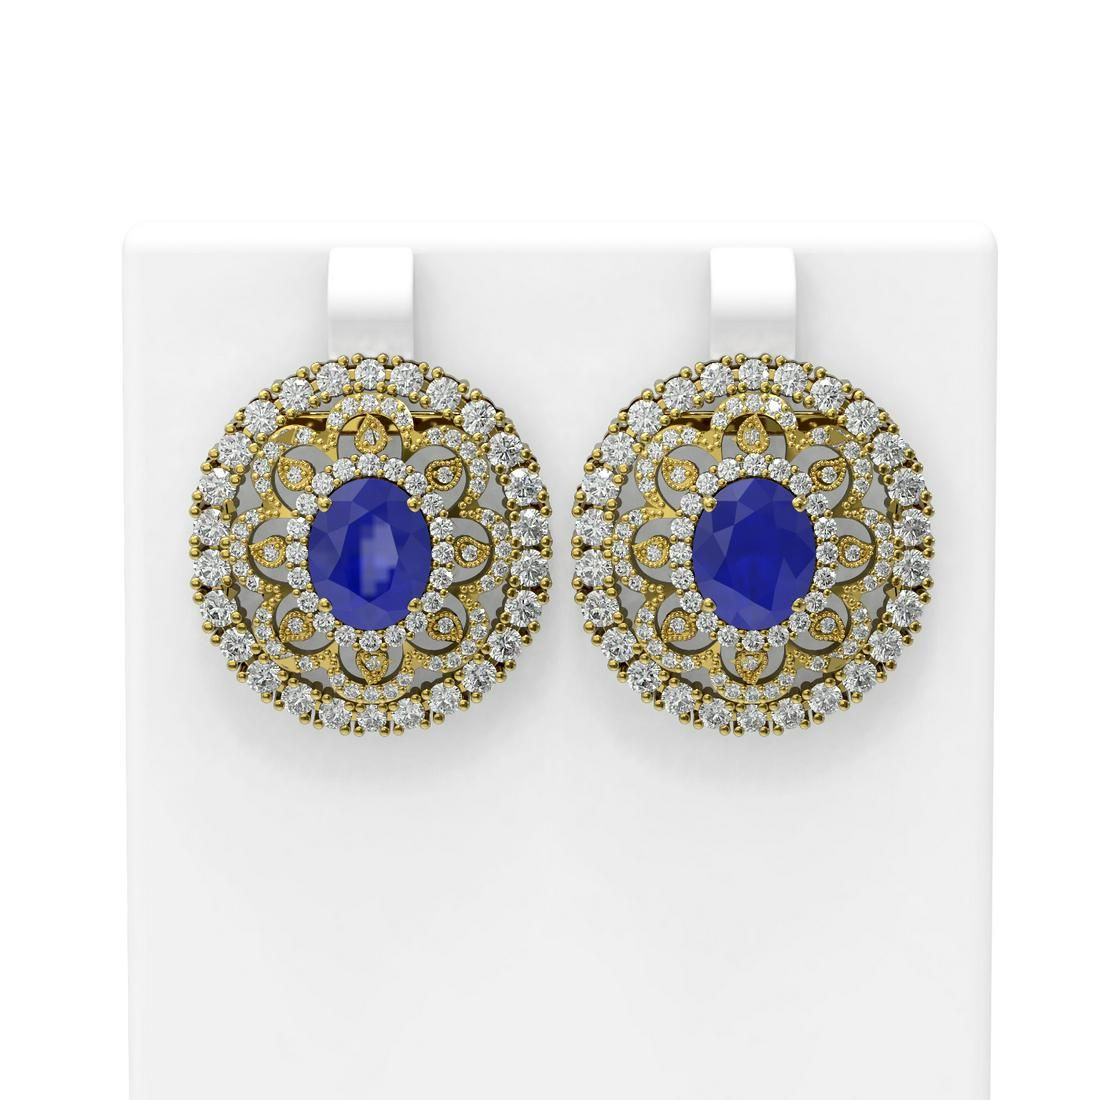 13.11 ctw Sapphire & Diamond Earrings 18K Yellow Gold -